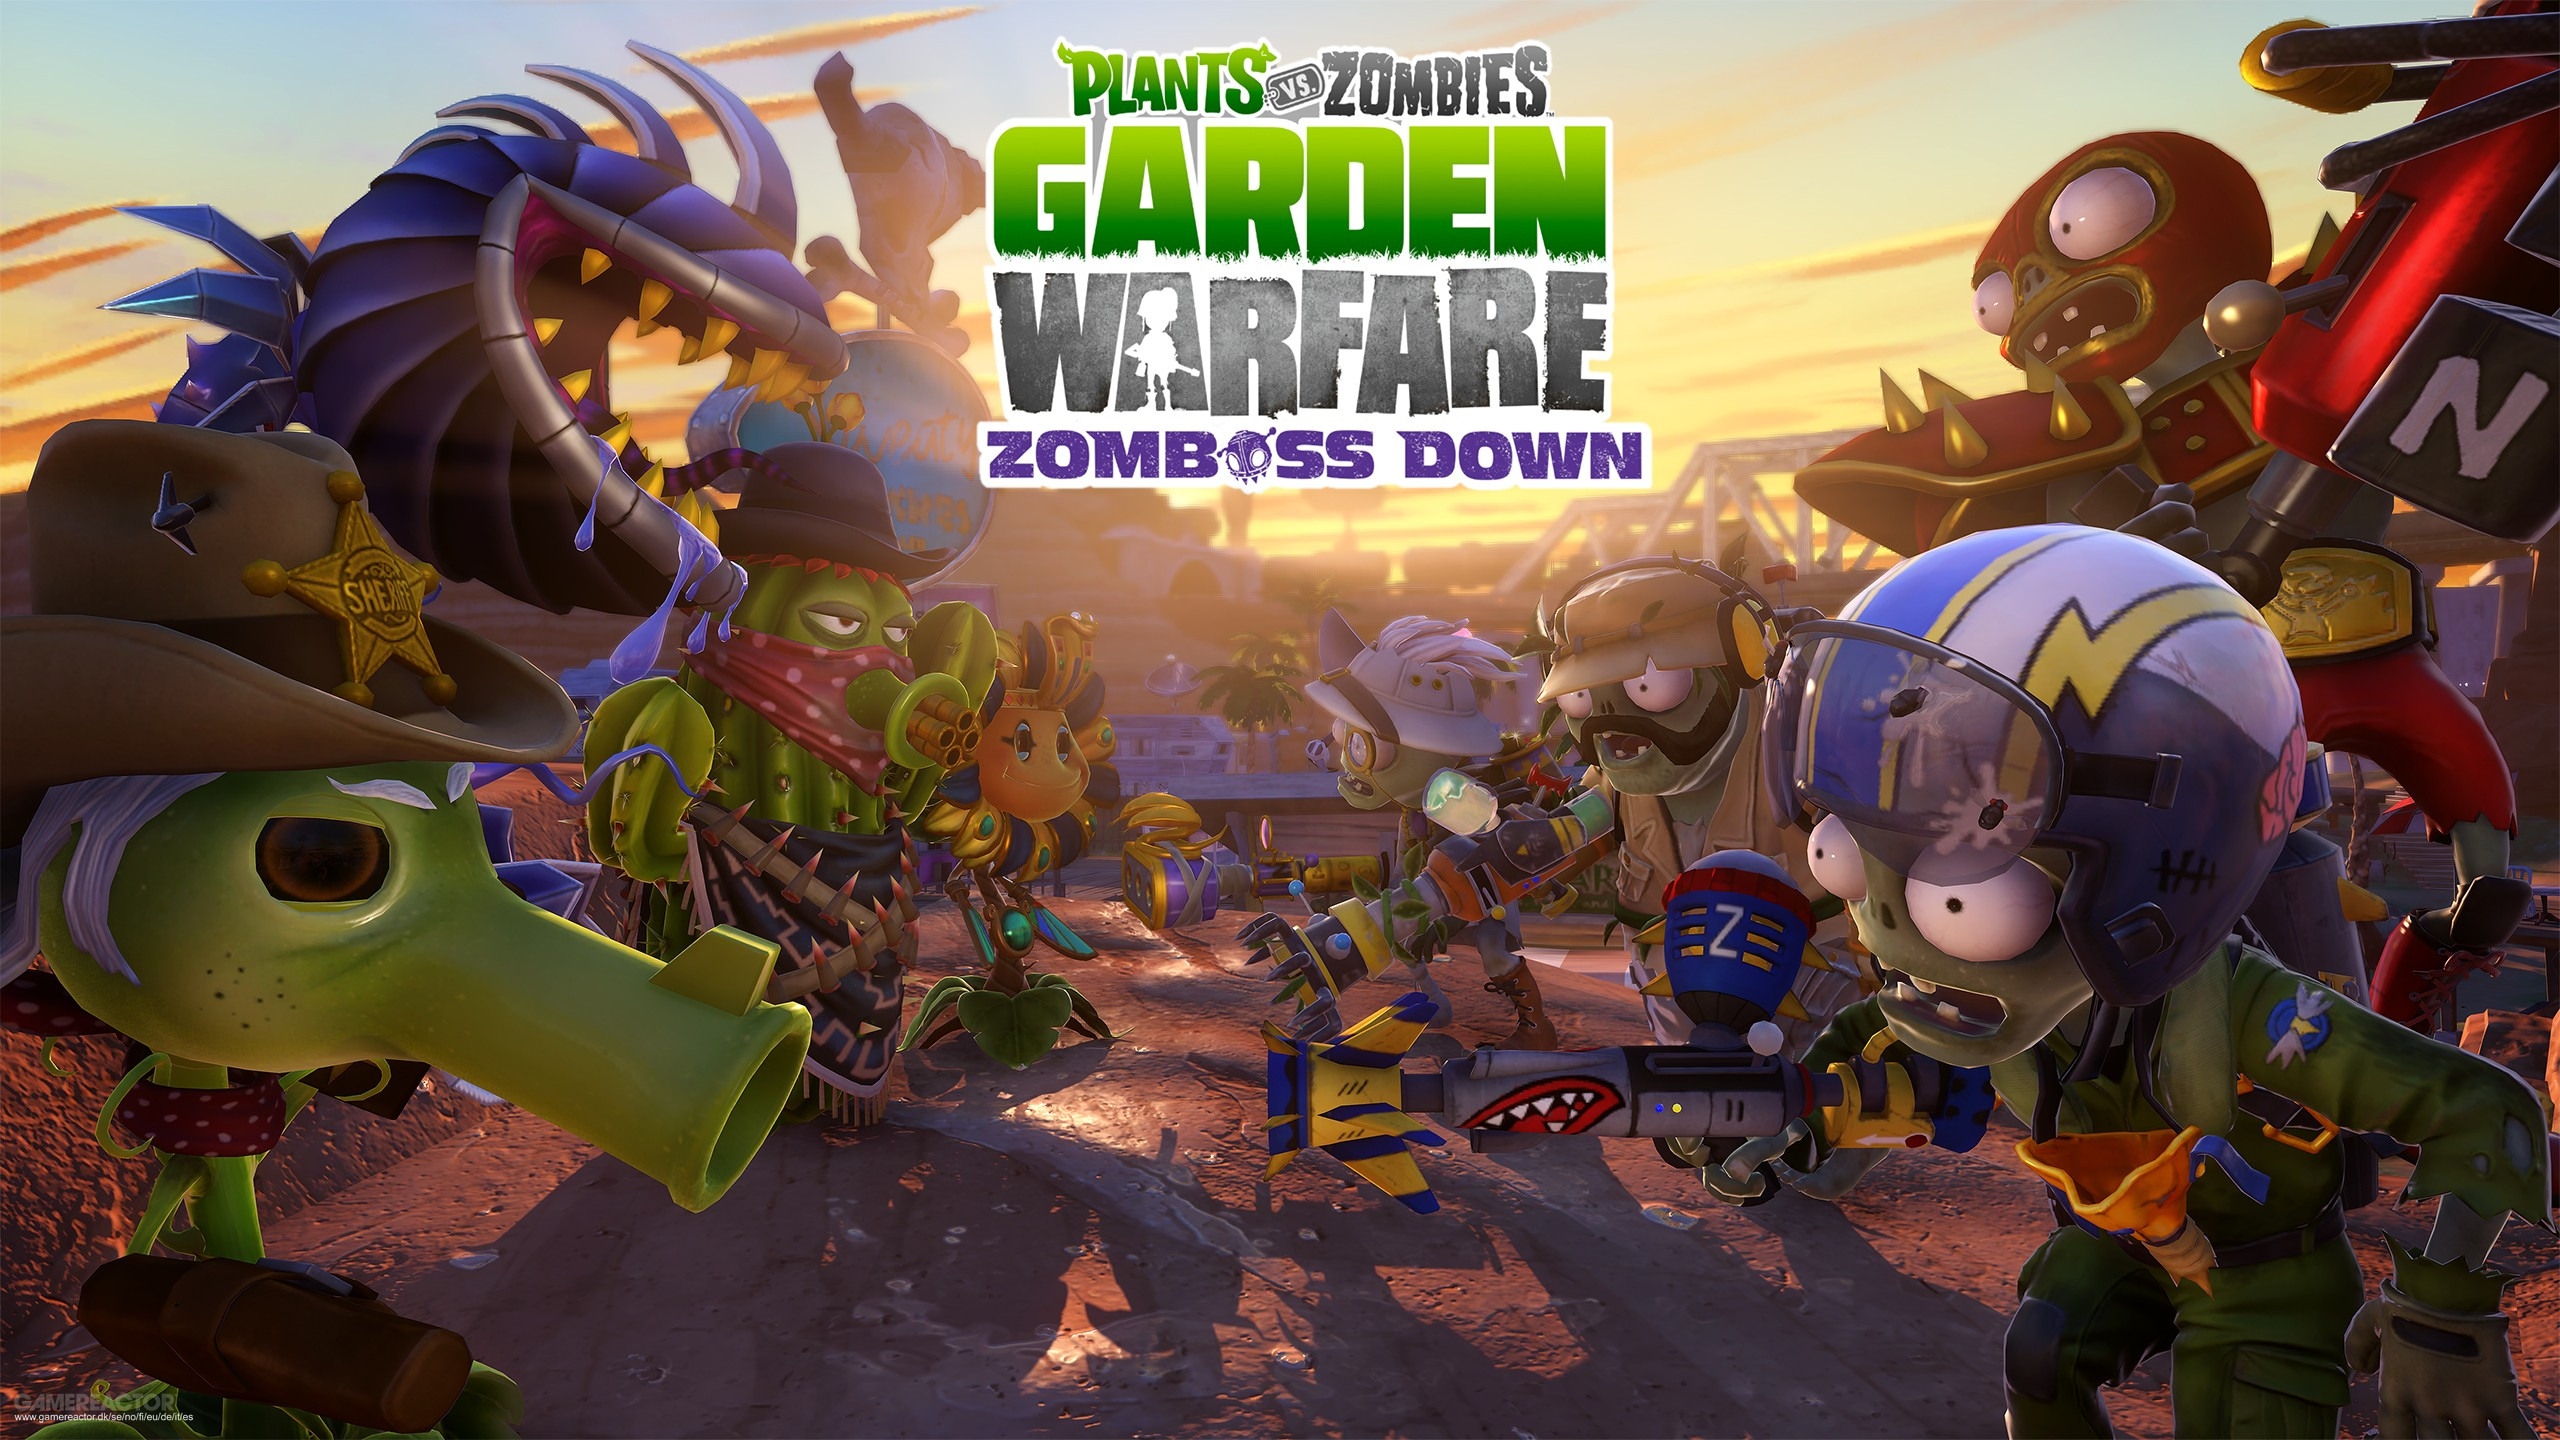 Pictures of Garden Warfare gets Zomboss Down DLC 1/5